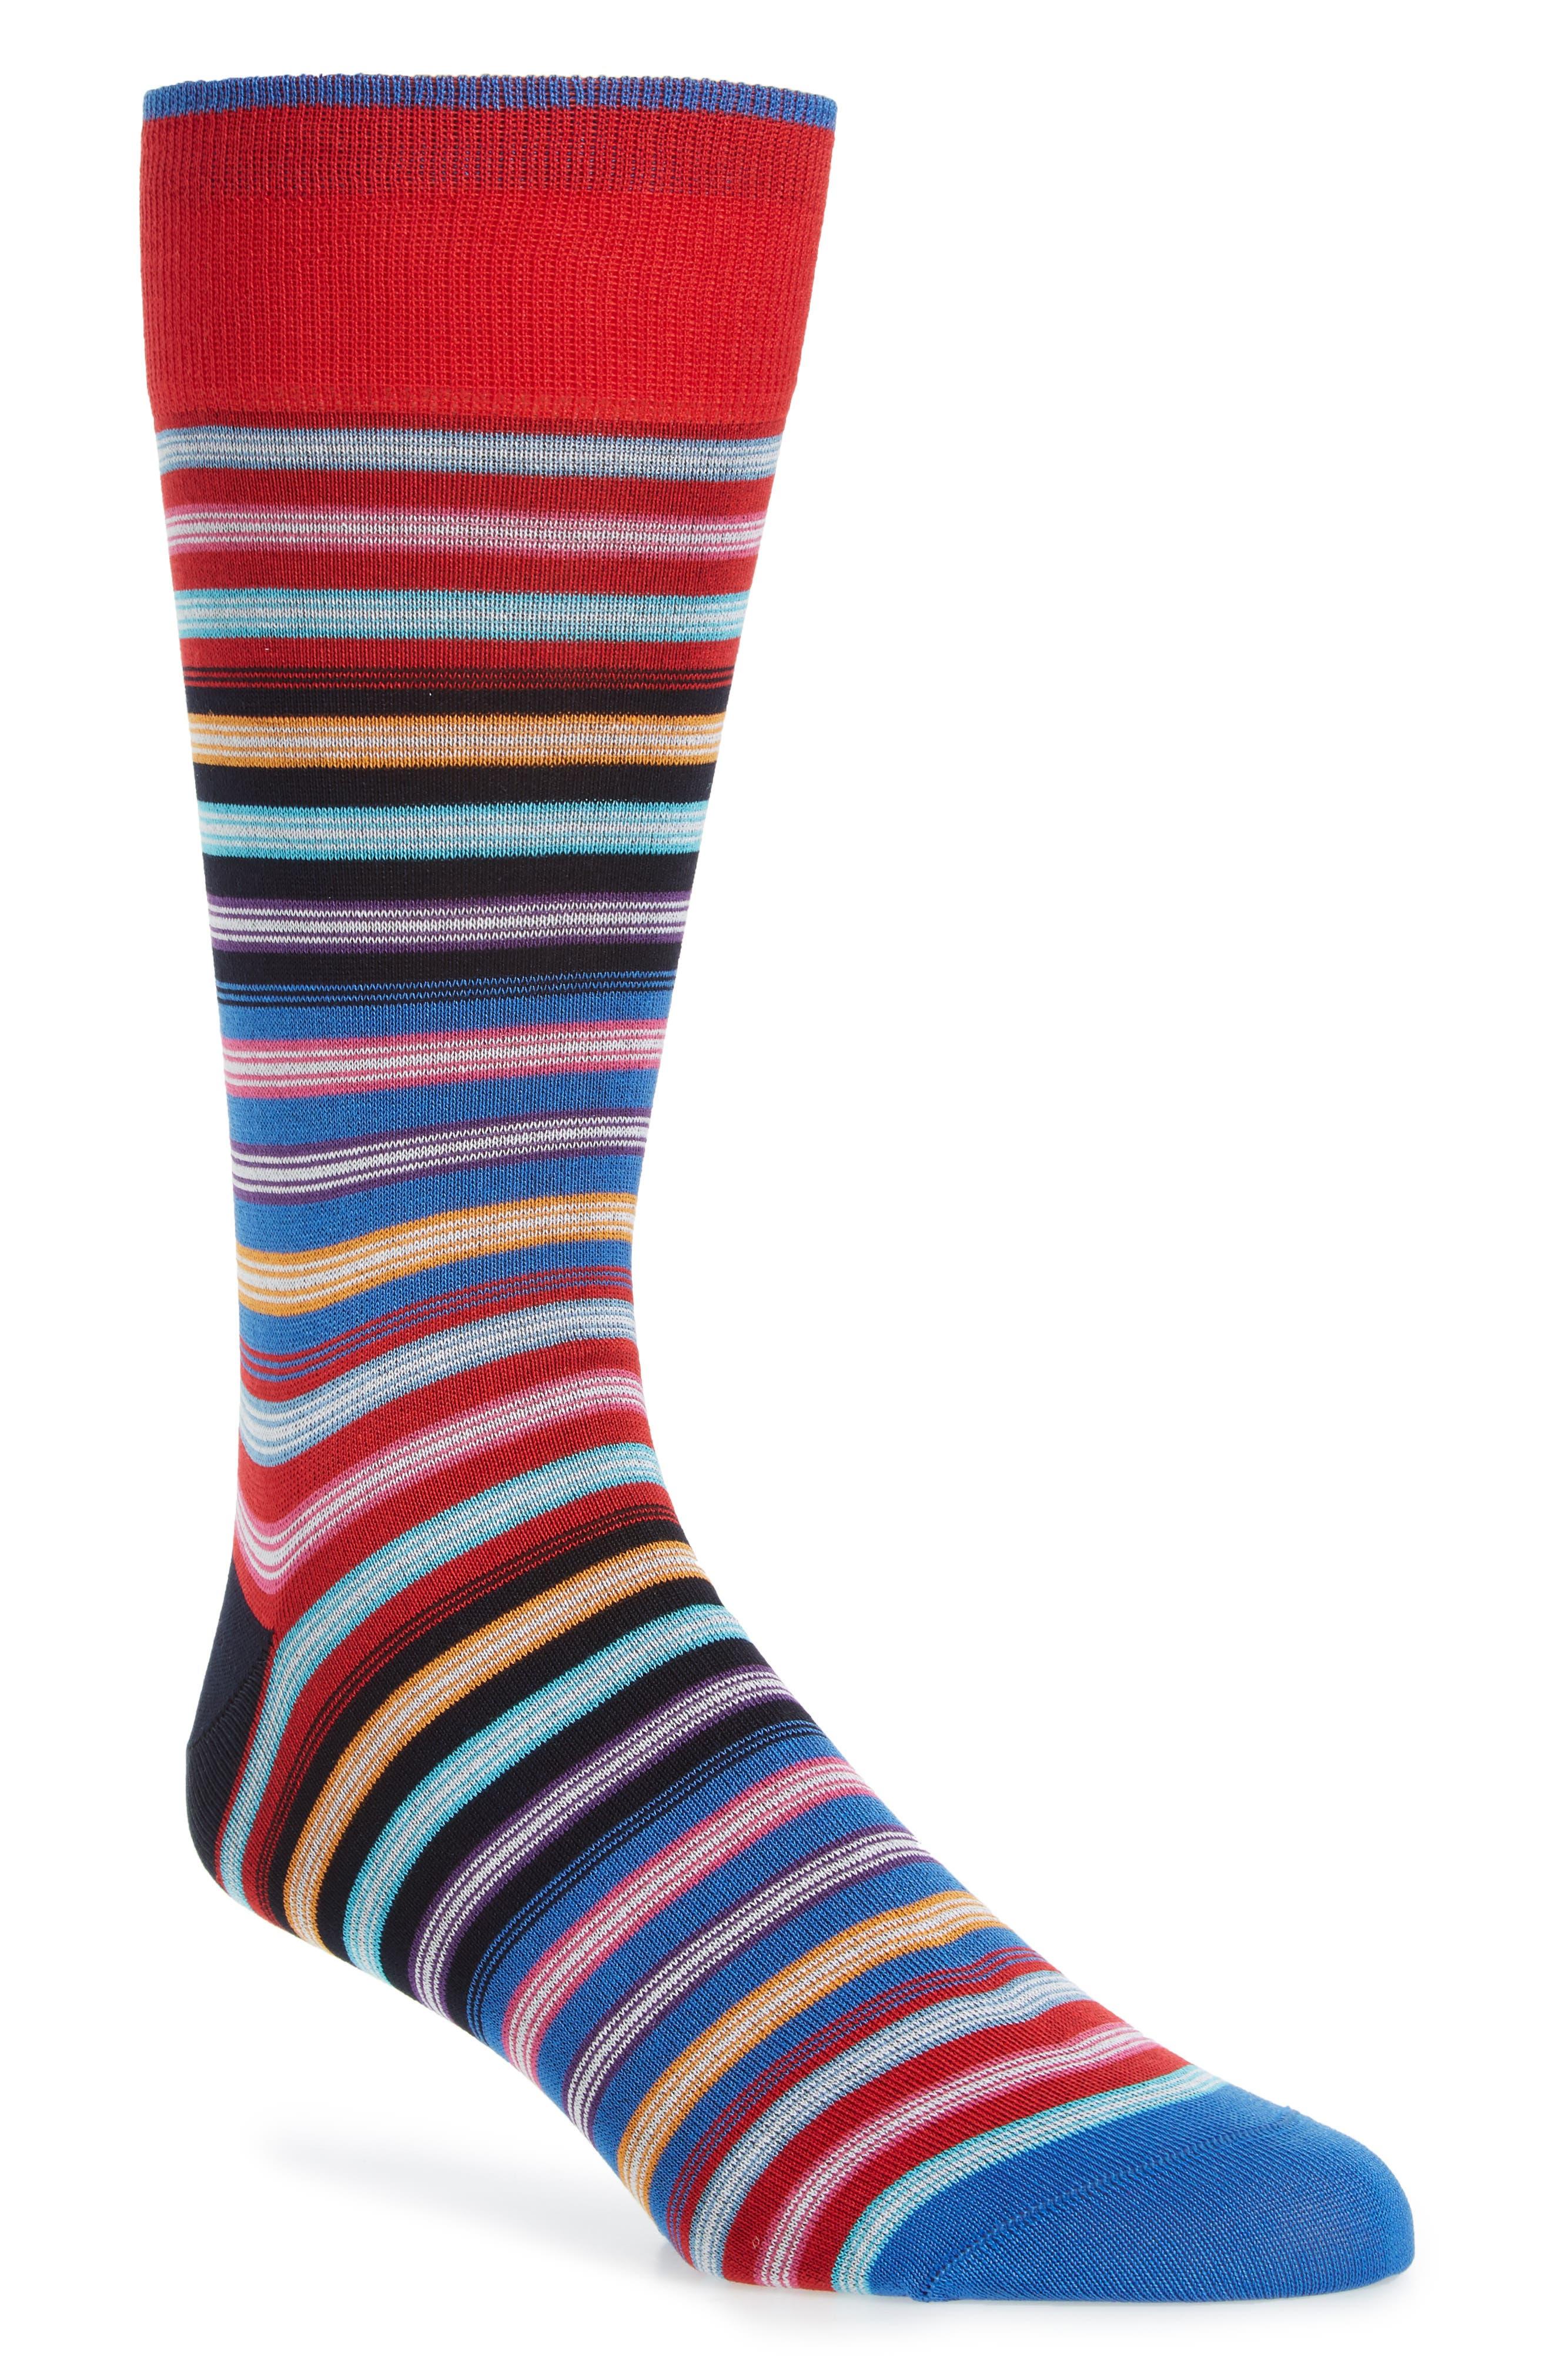 Cotton Blend Socks,                             Main thumbnail 1, color,                             Ruby